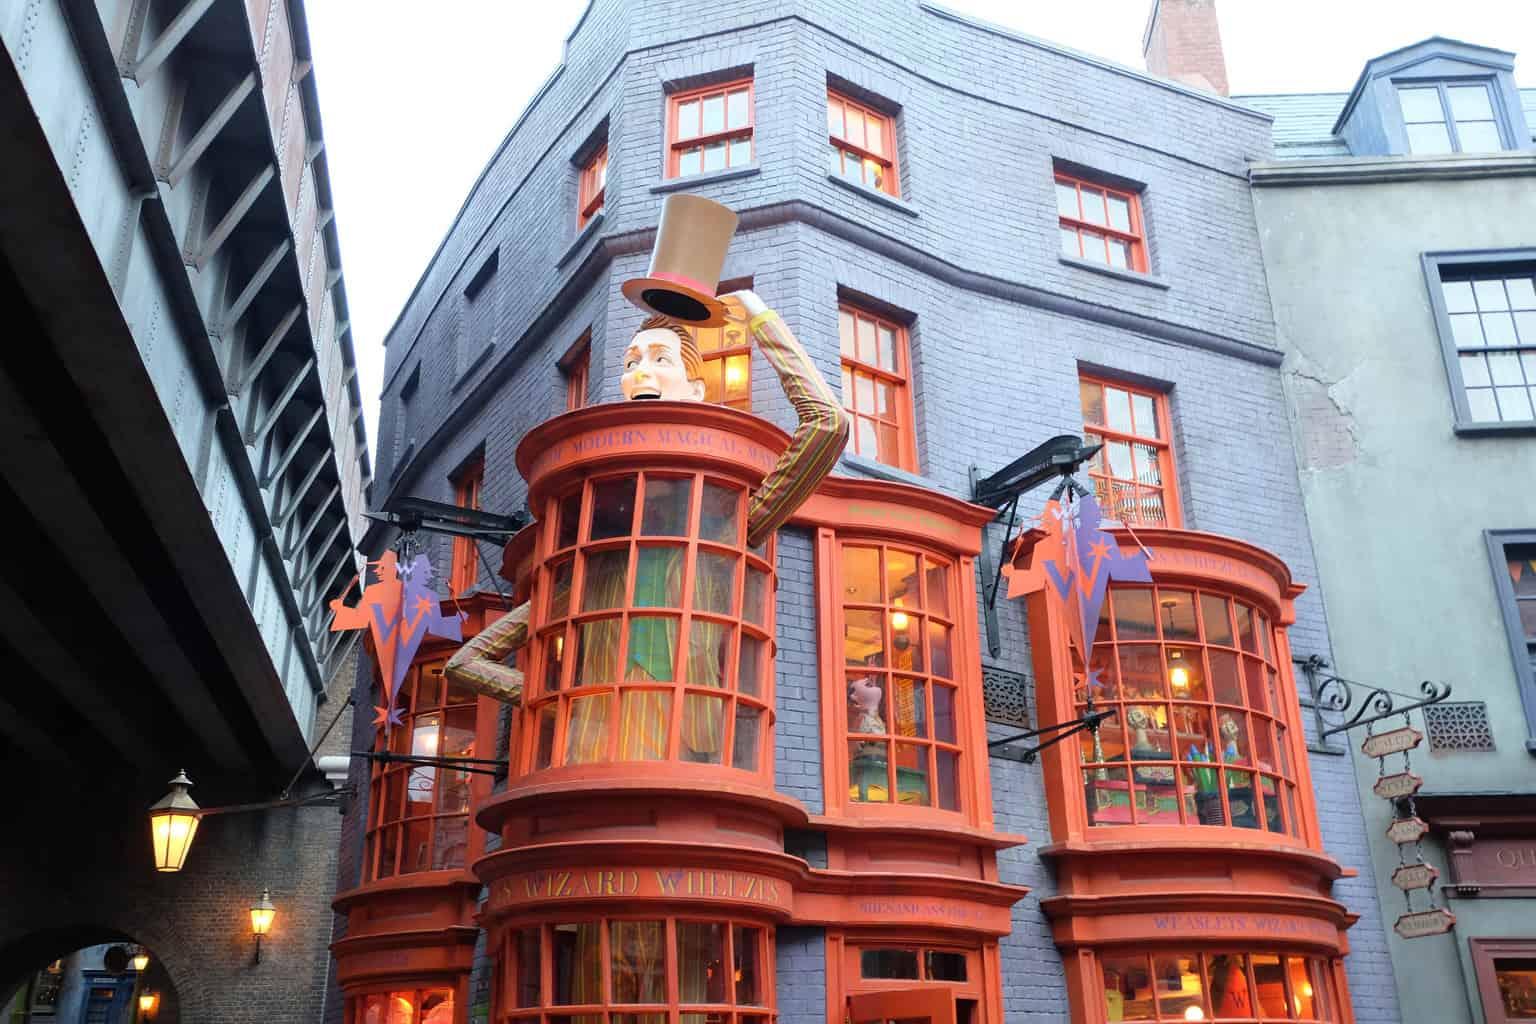 wizarding world of harry potter polkadotsandpixiedust.com